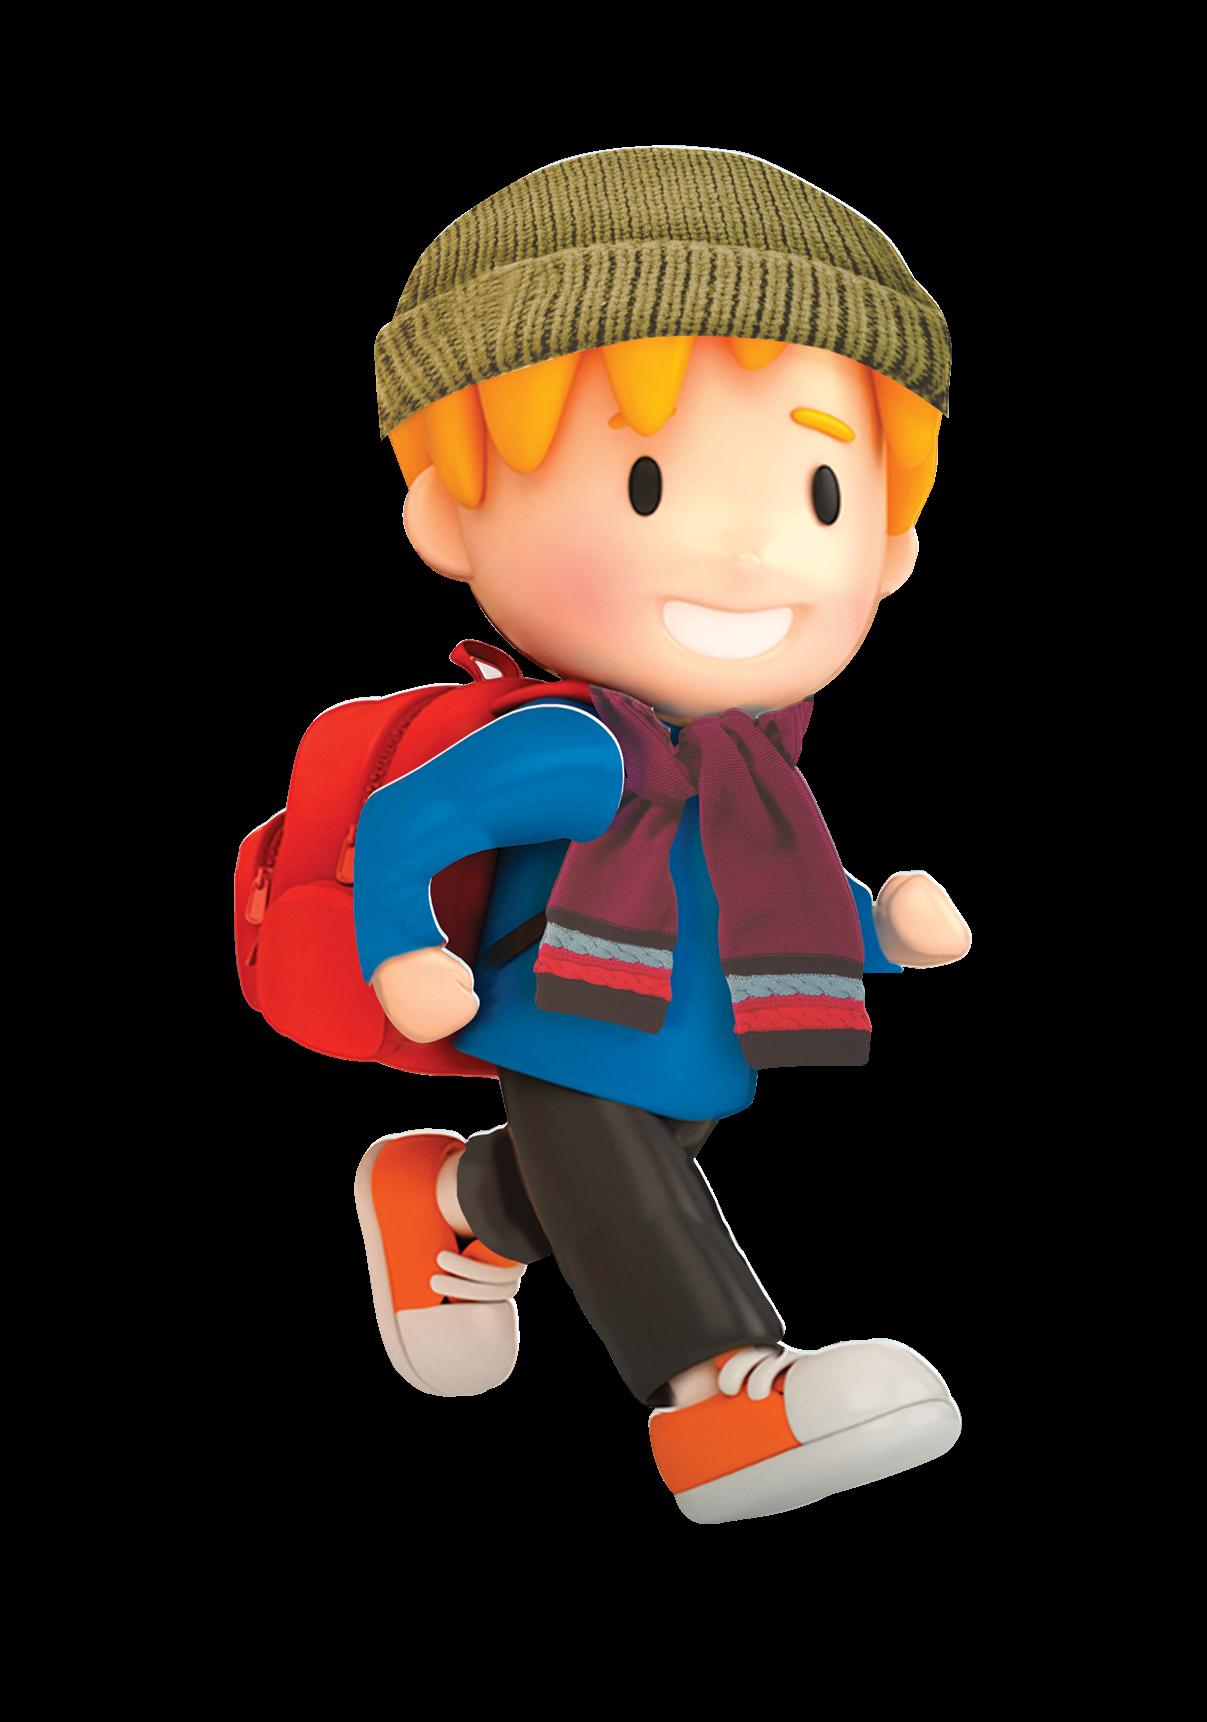 Student clipart walking. Winter walk to school